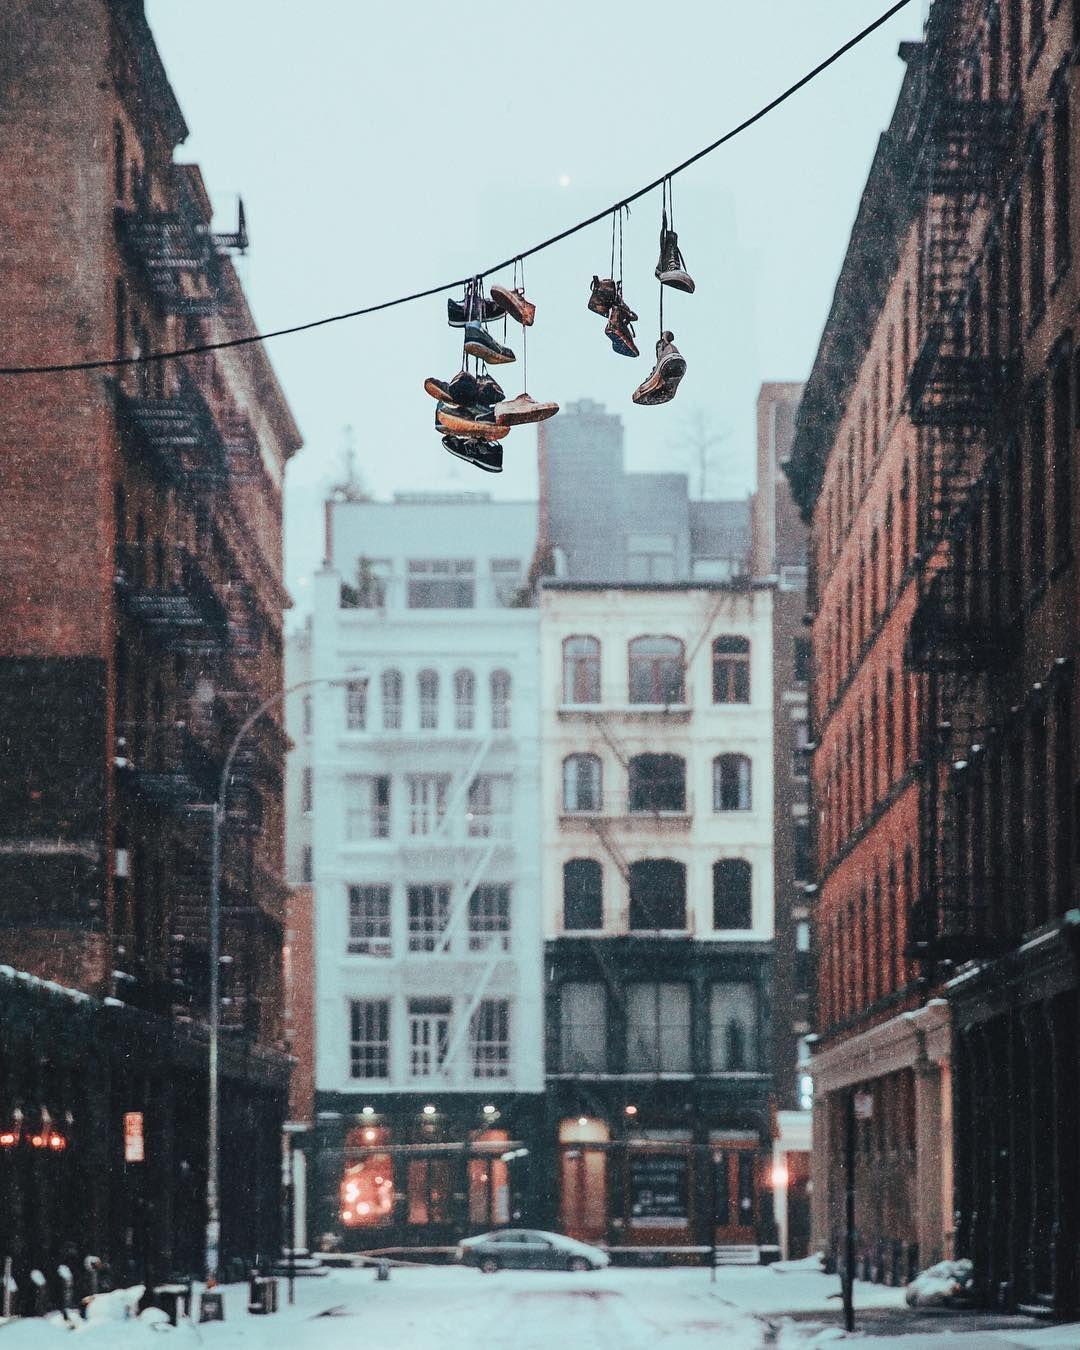 New York City Street Photography By David Everly Art Photography Street Photography City Streets Photography Street Photography City Aesthetic